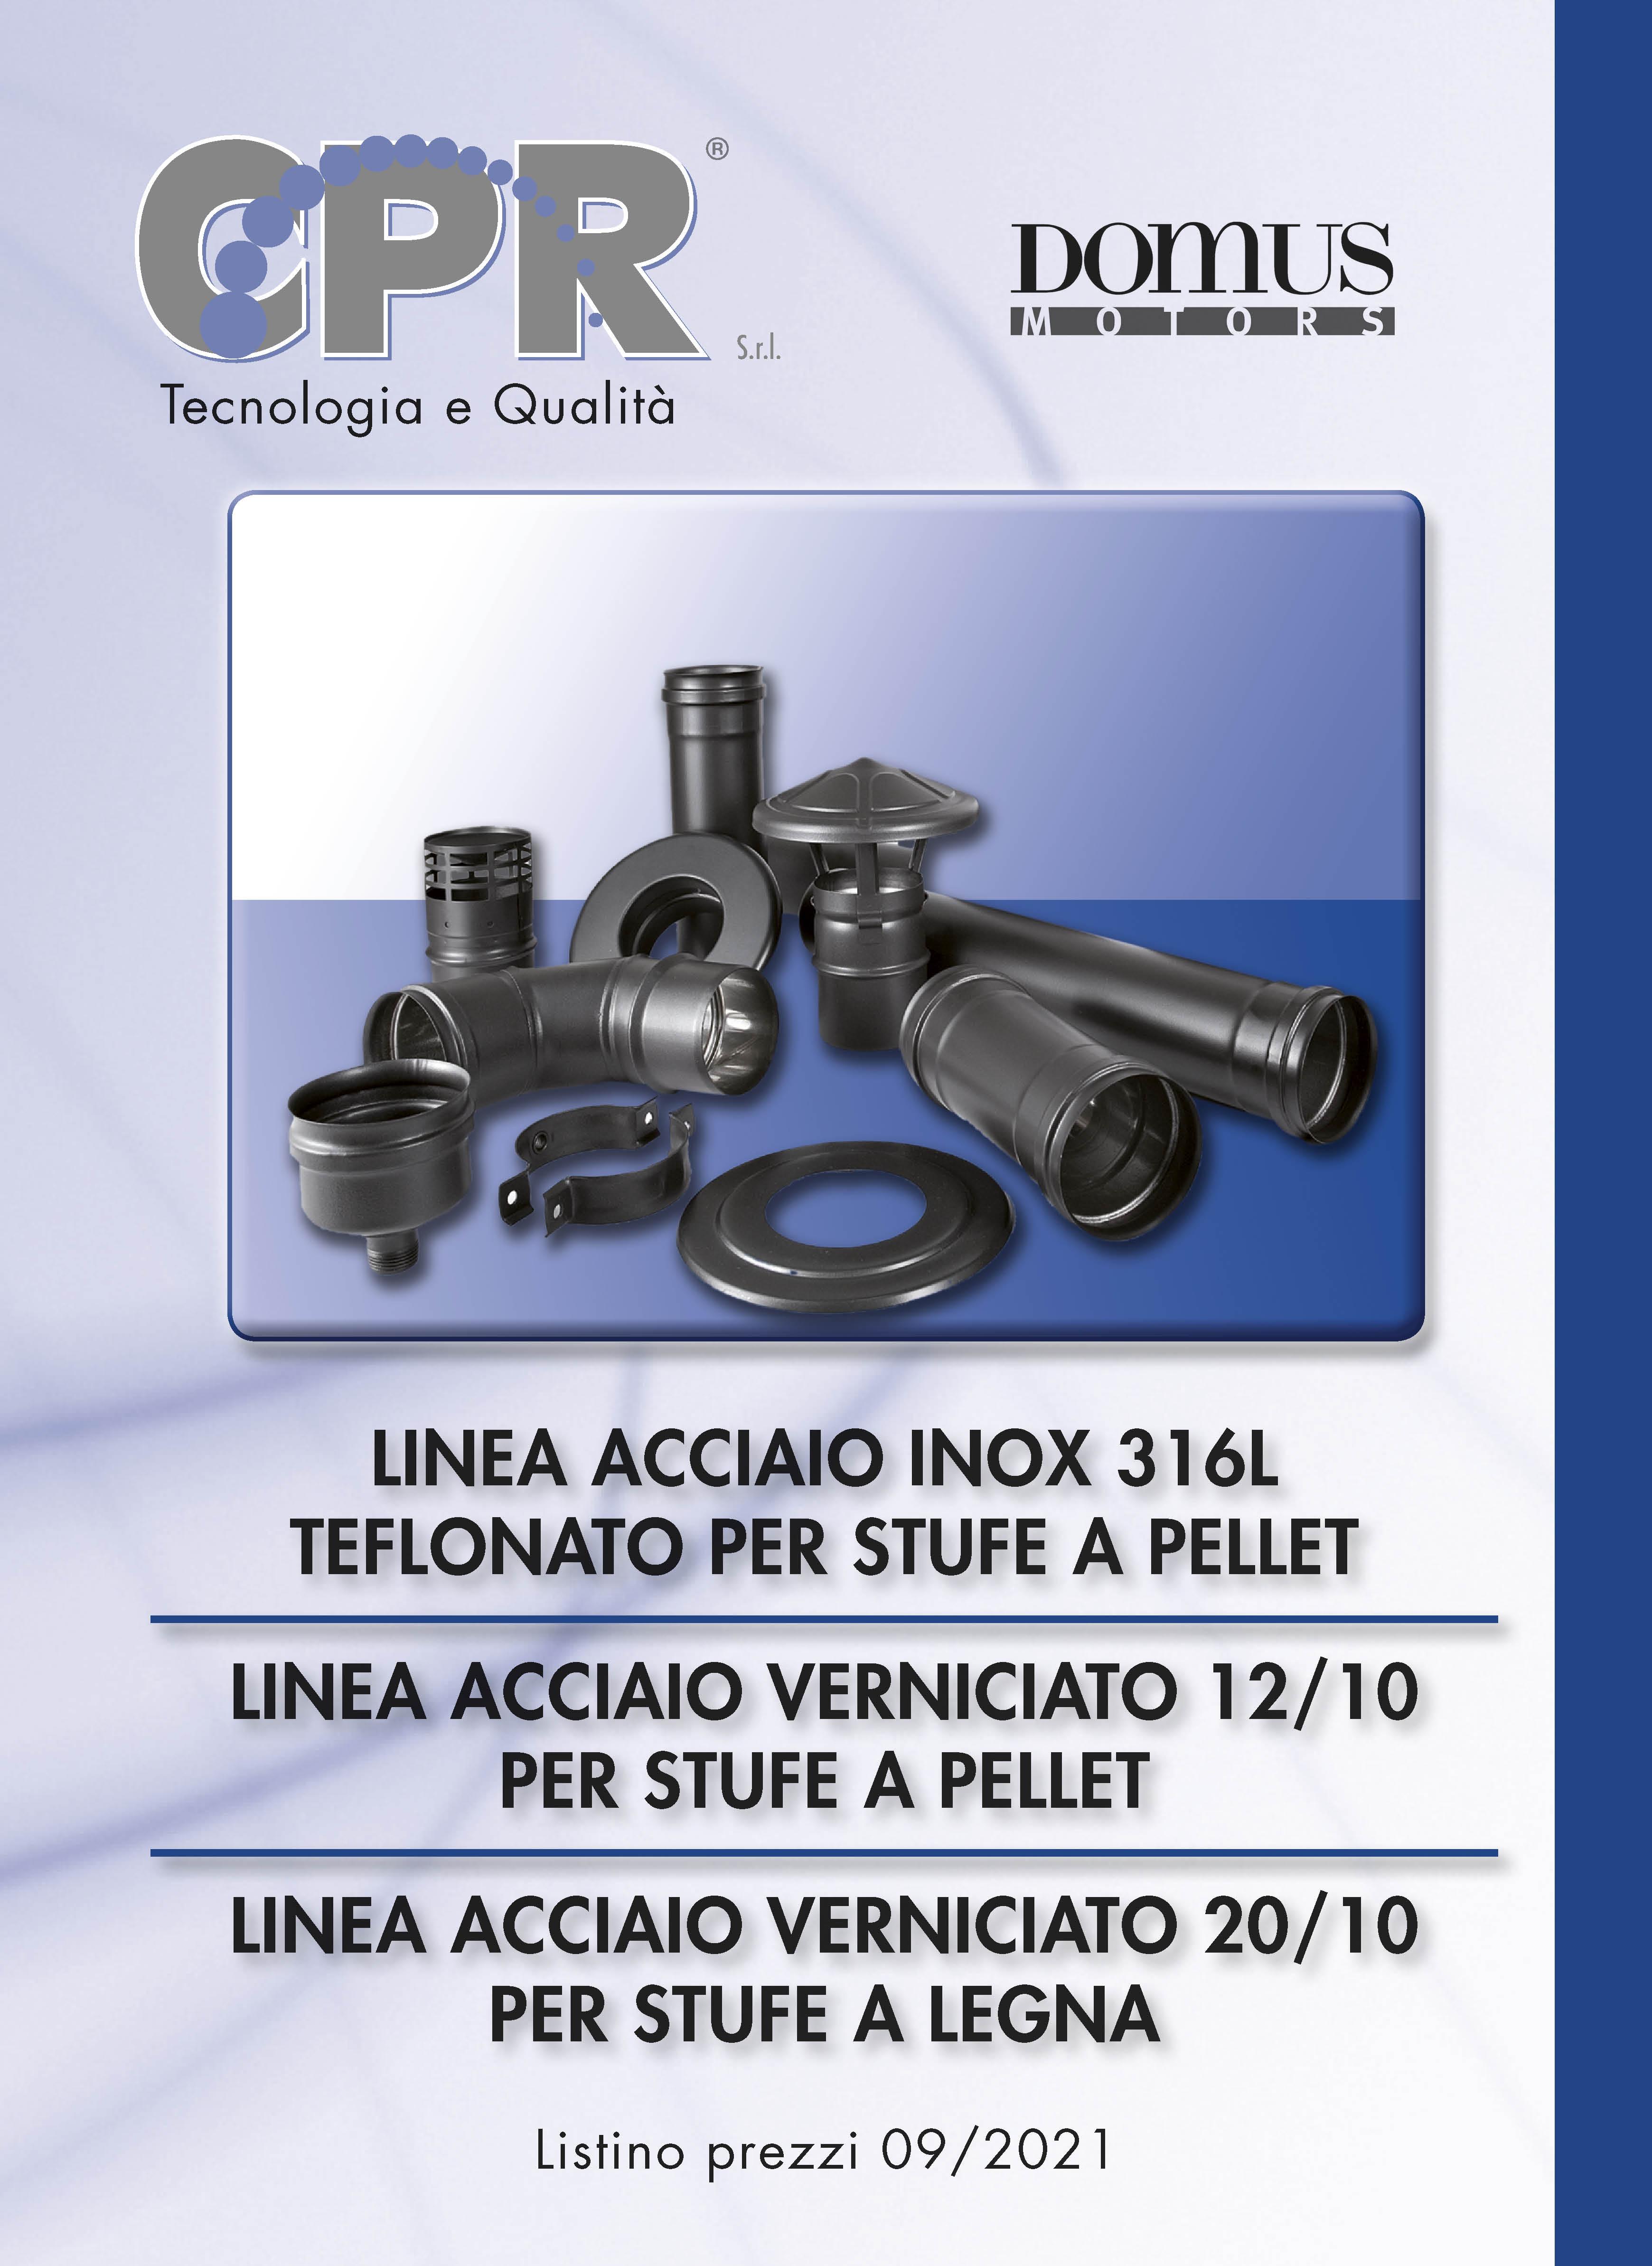 Catalogo pellet e acciaio verniciato per stufe a legna 01/2021